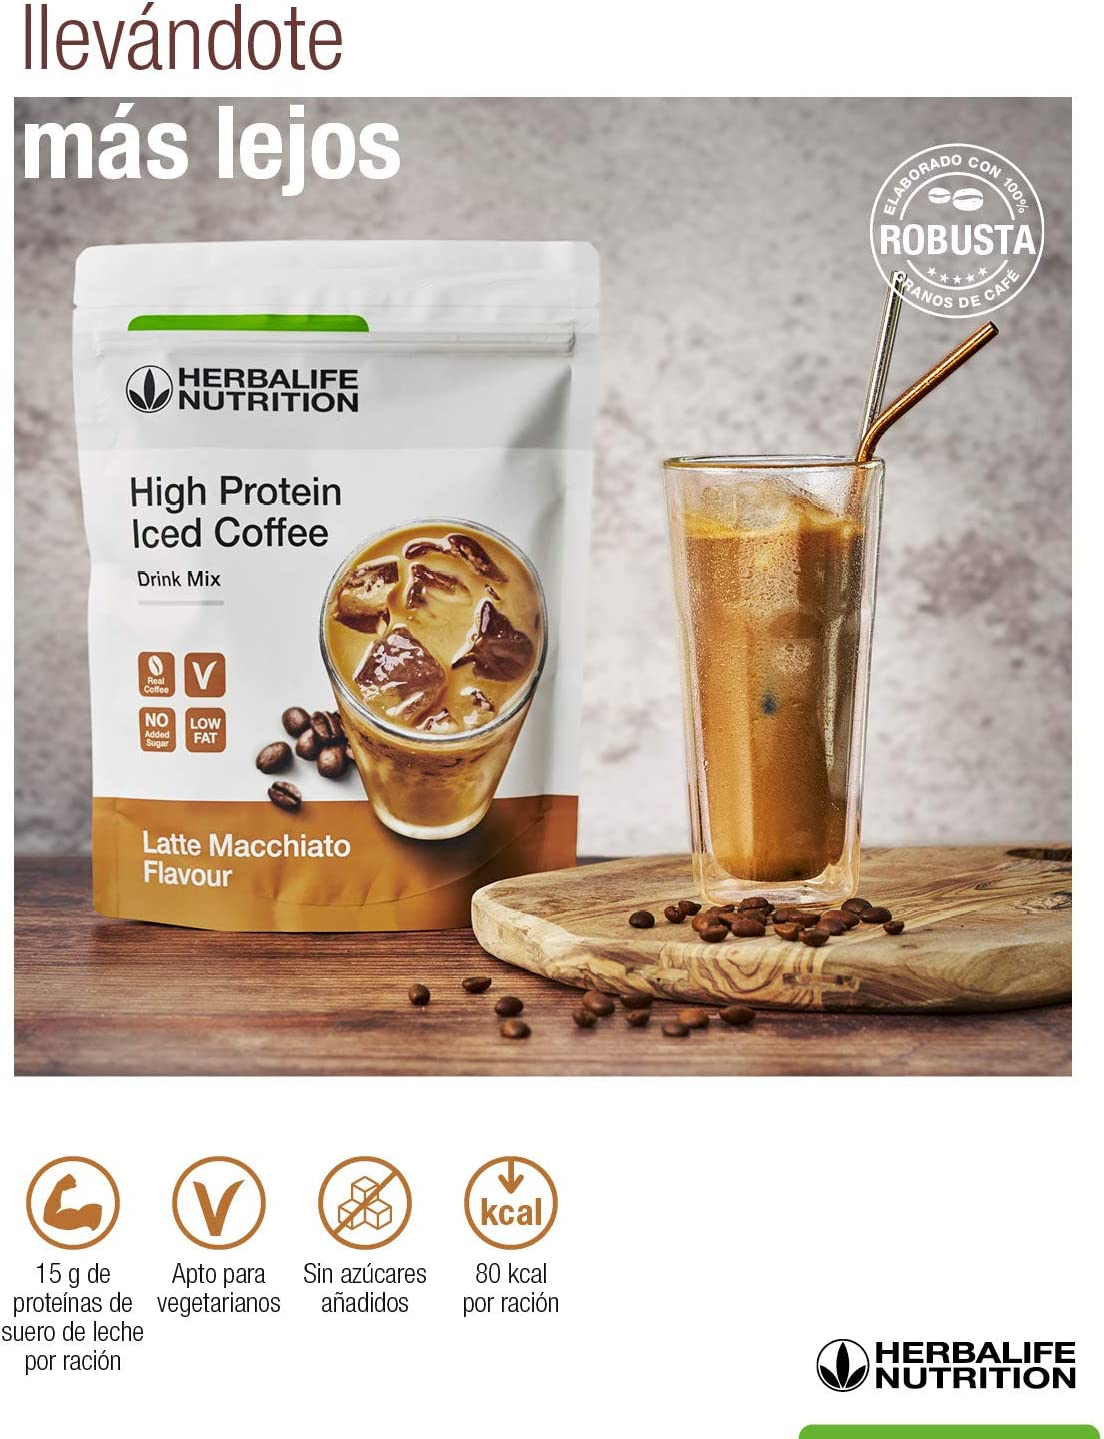 Herbalife - Proteina sabor a Café Helado - High Protein Iced Coffee Latte macchiato 308 g